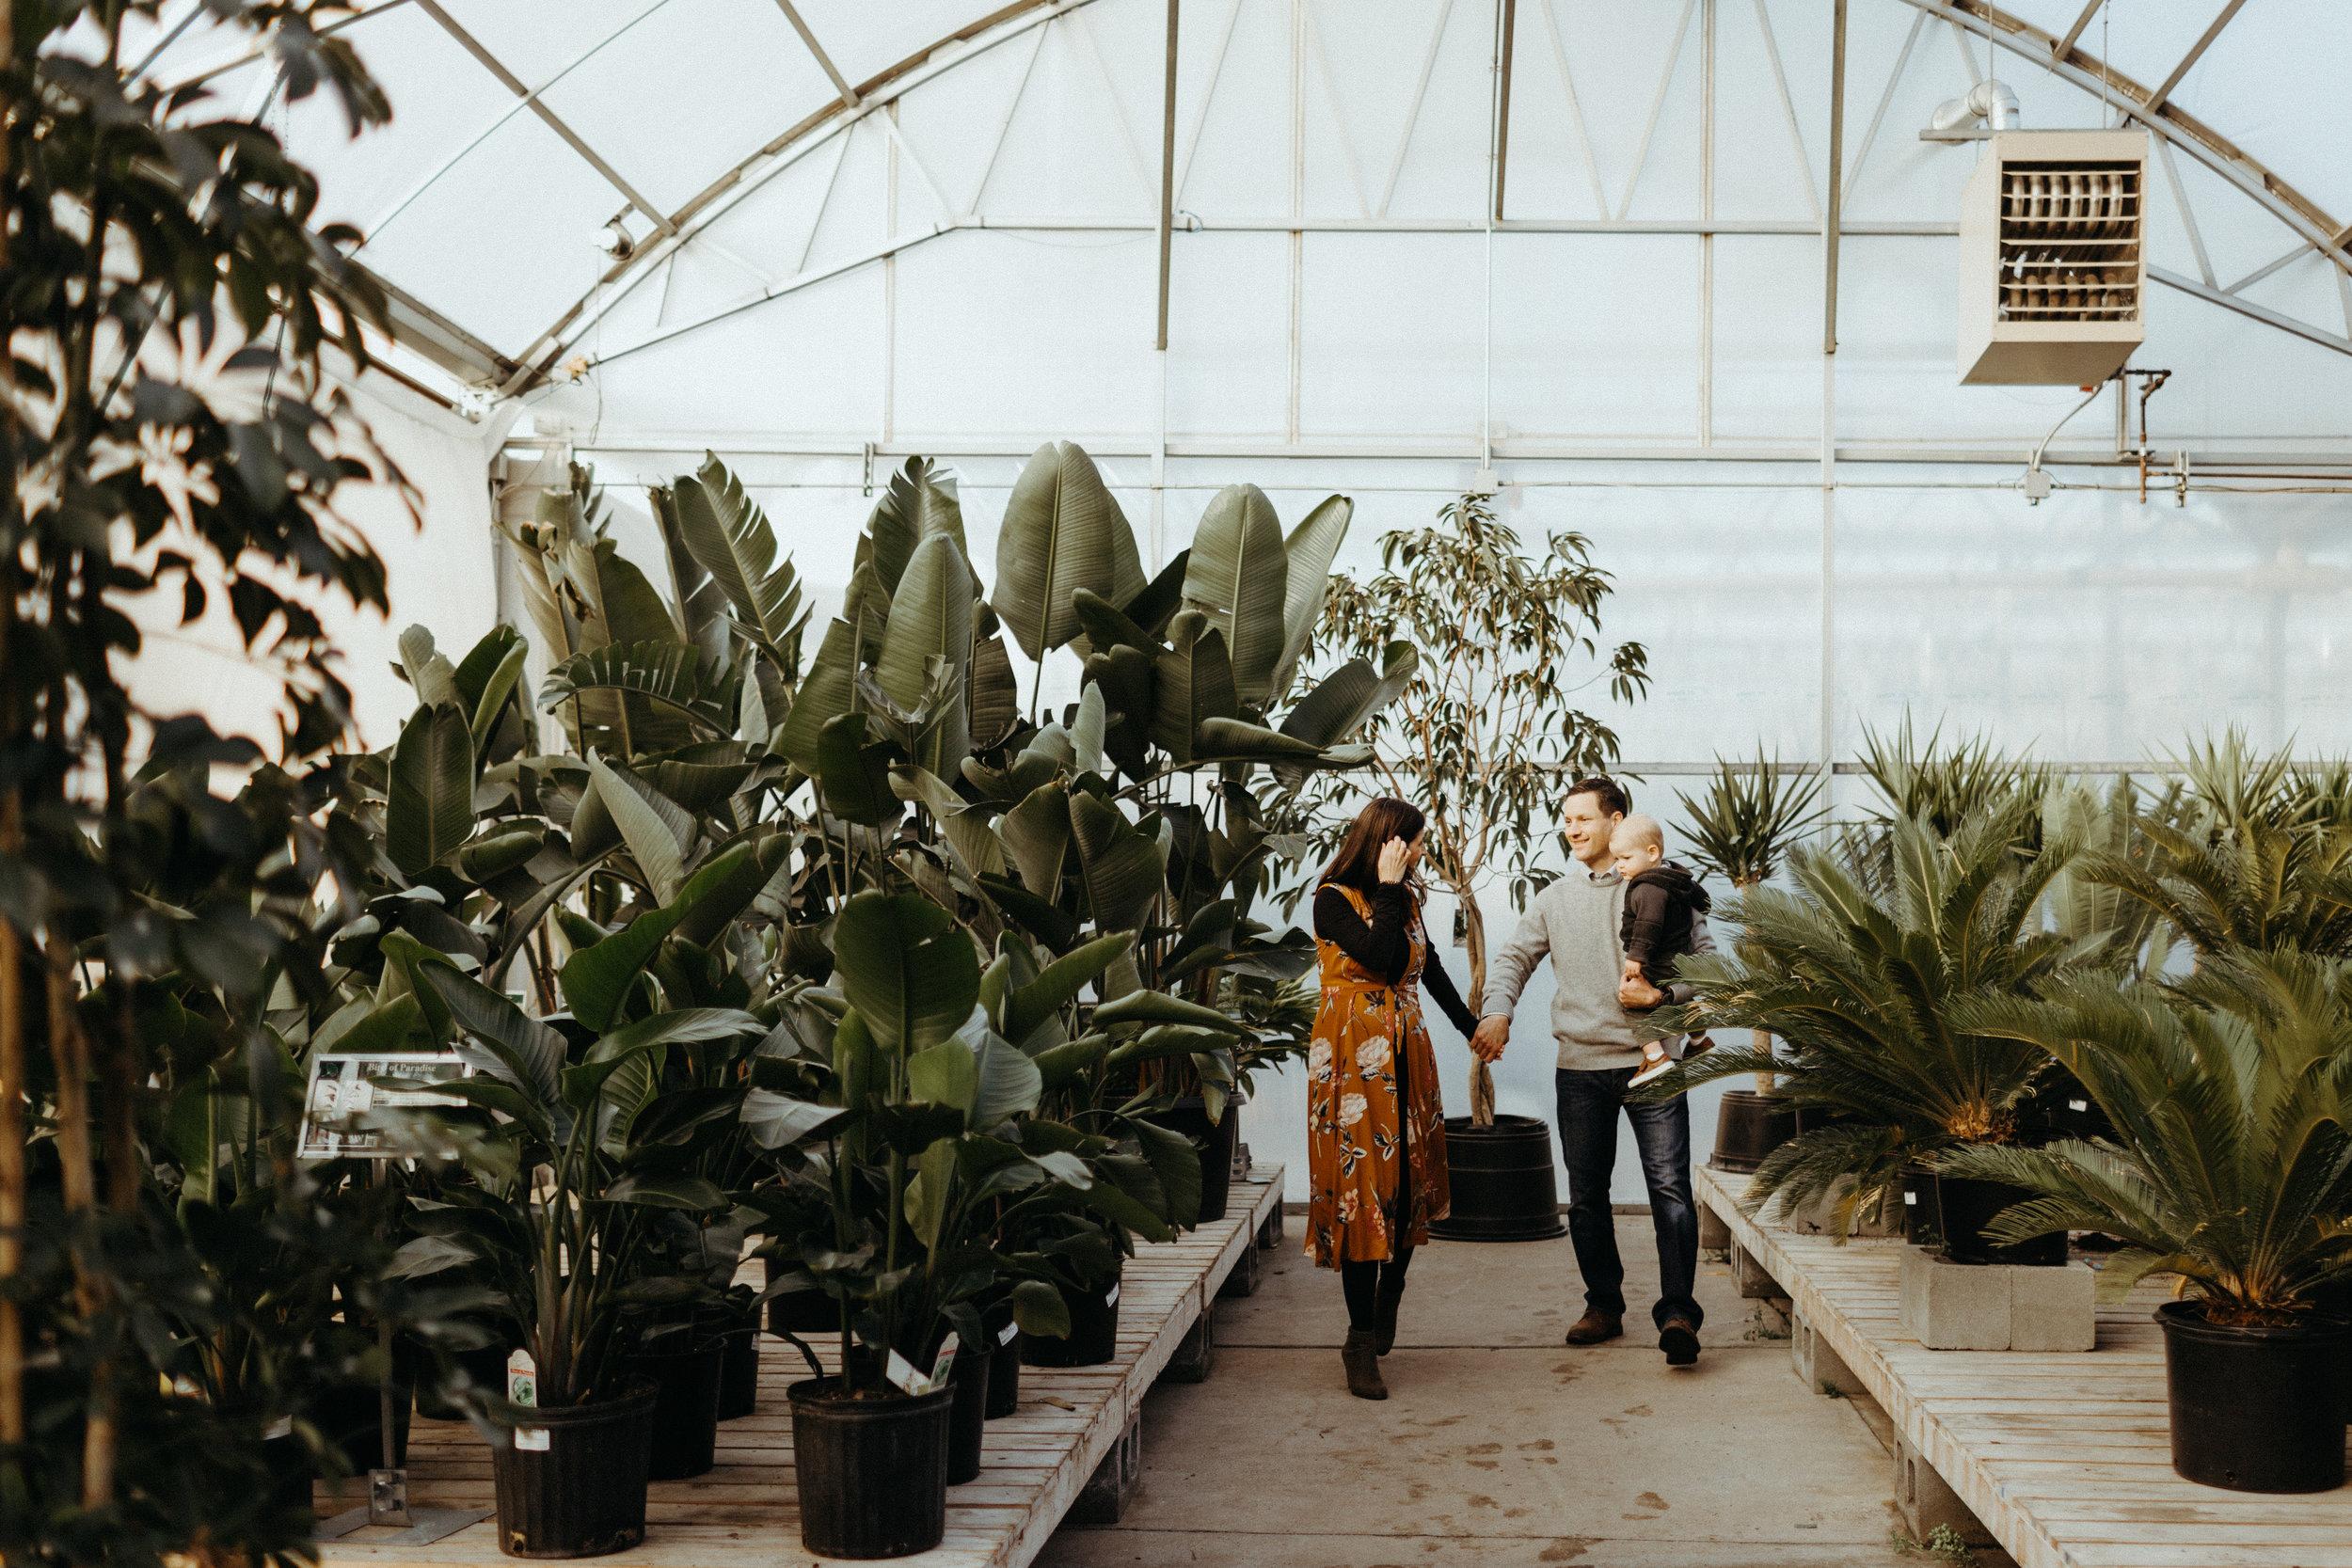 The Iwanskys Omaha Ne Mulhalls Greenhouse Family